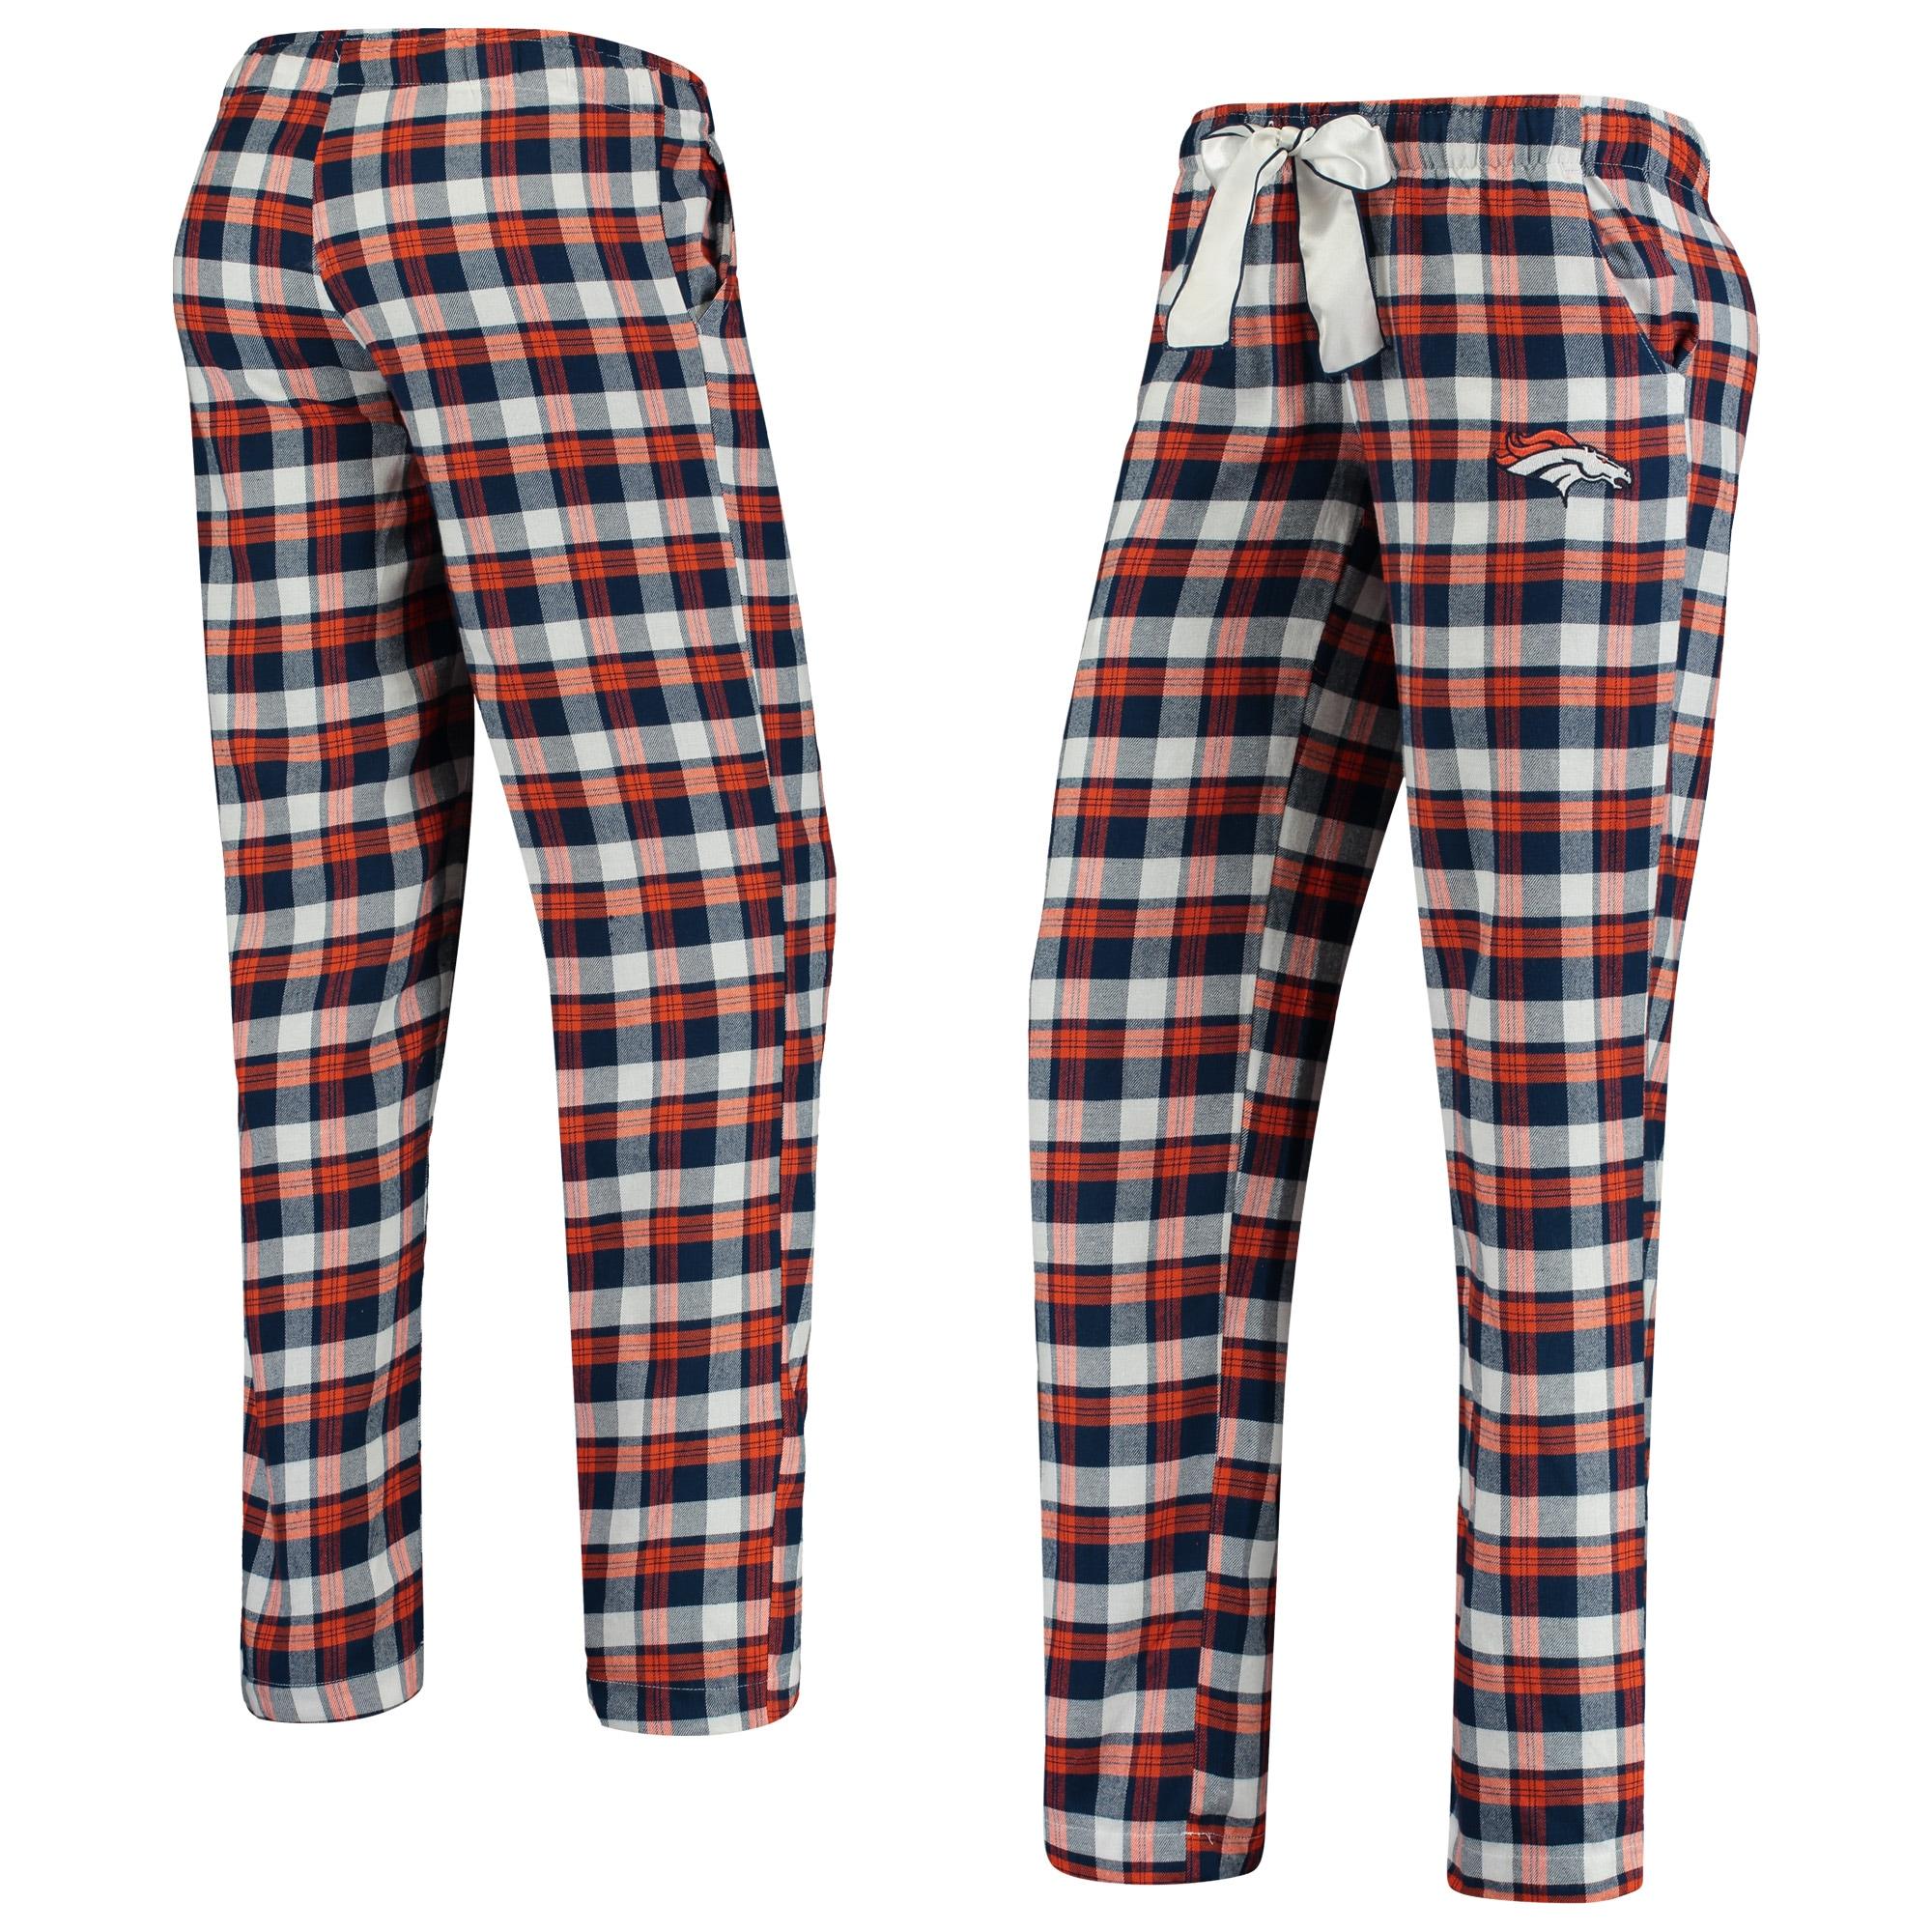 Denver Broncos Concepts Sport Women's Piedmont Flannel Sleep Pants - Navy/Orange